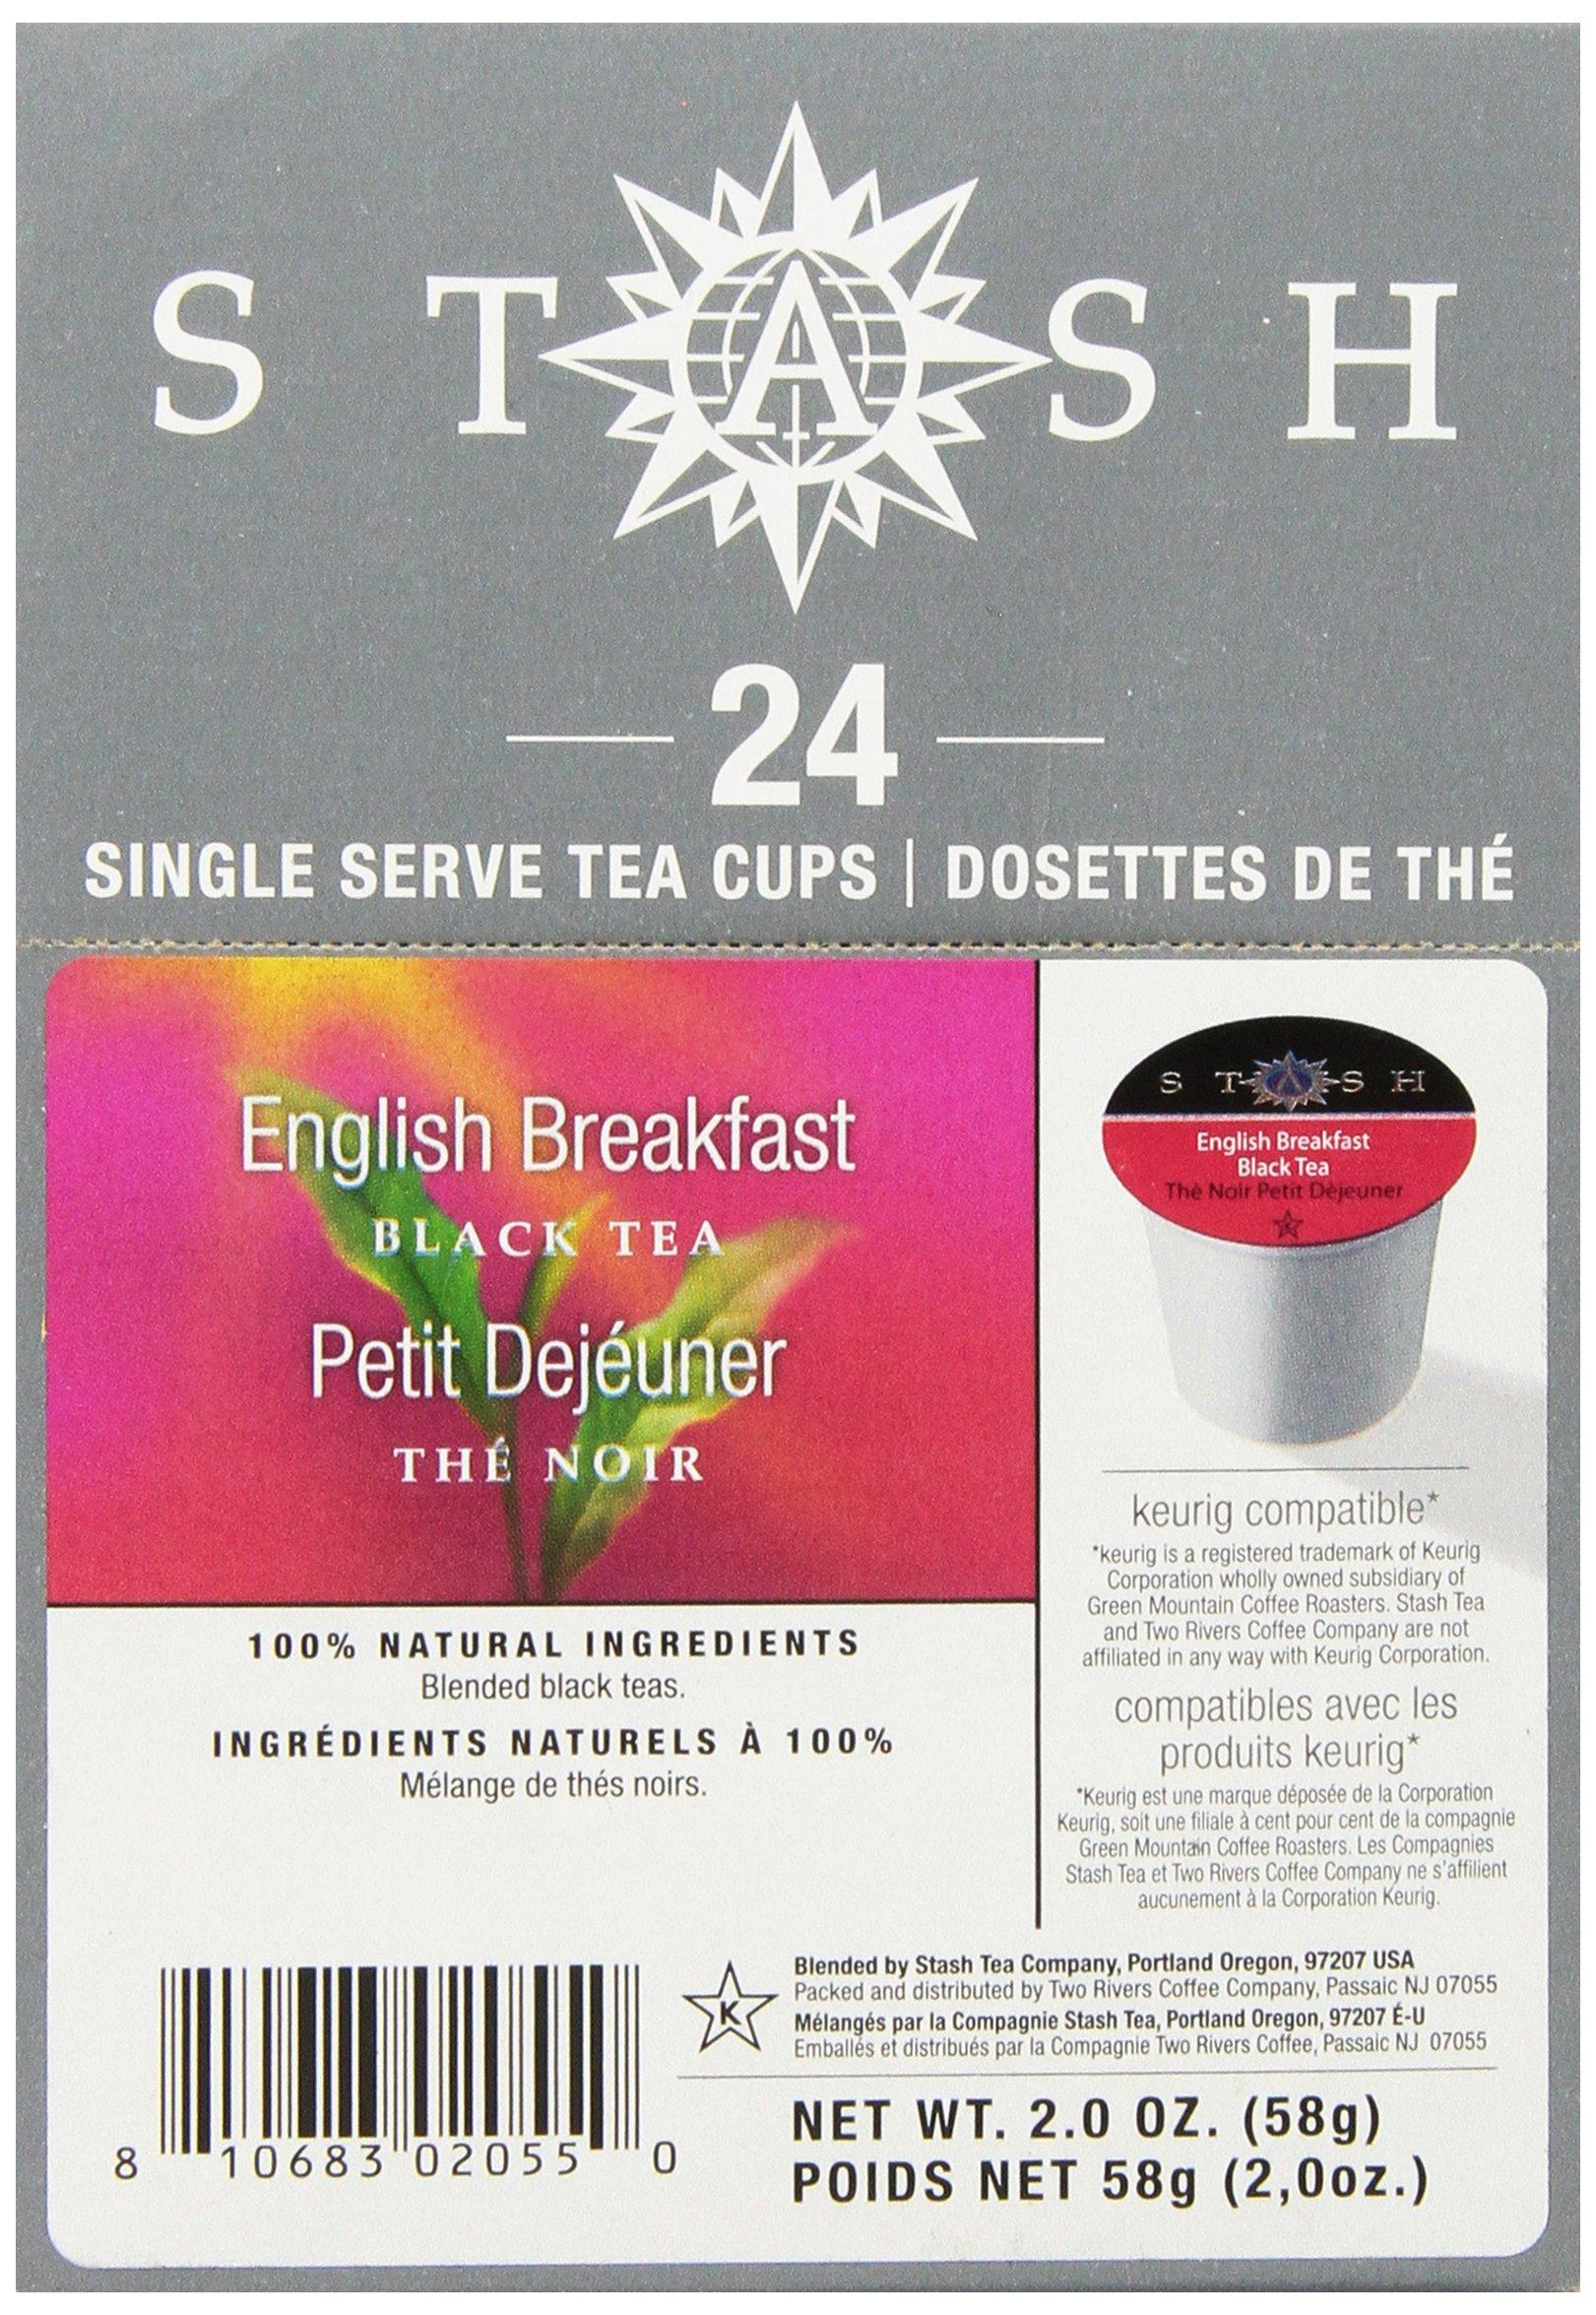 Stash Tea English Breakfast Single-Cup Tea for Keurig K-Cup Brewers, 24 Count